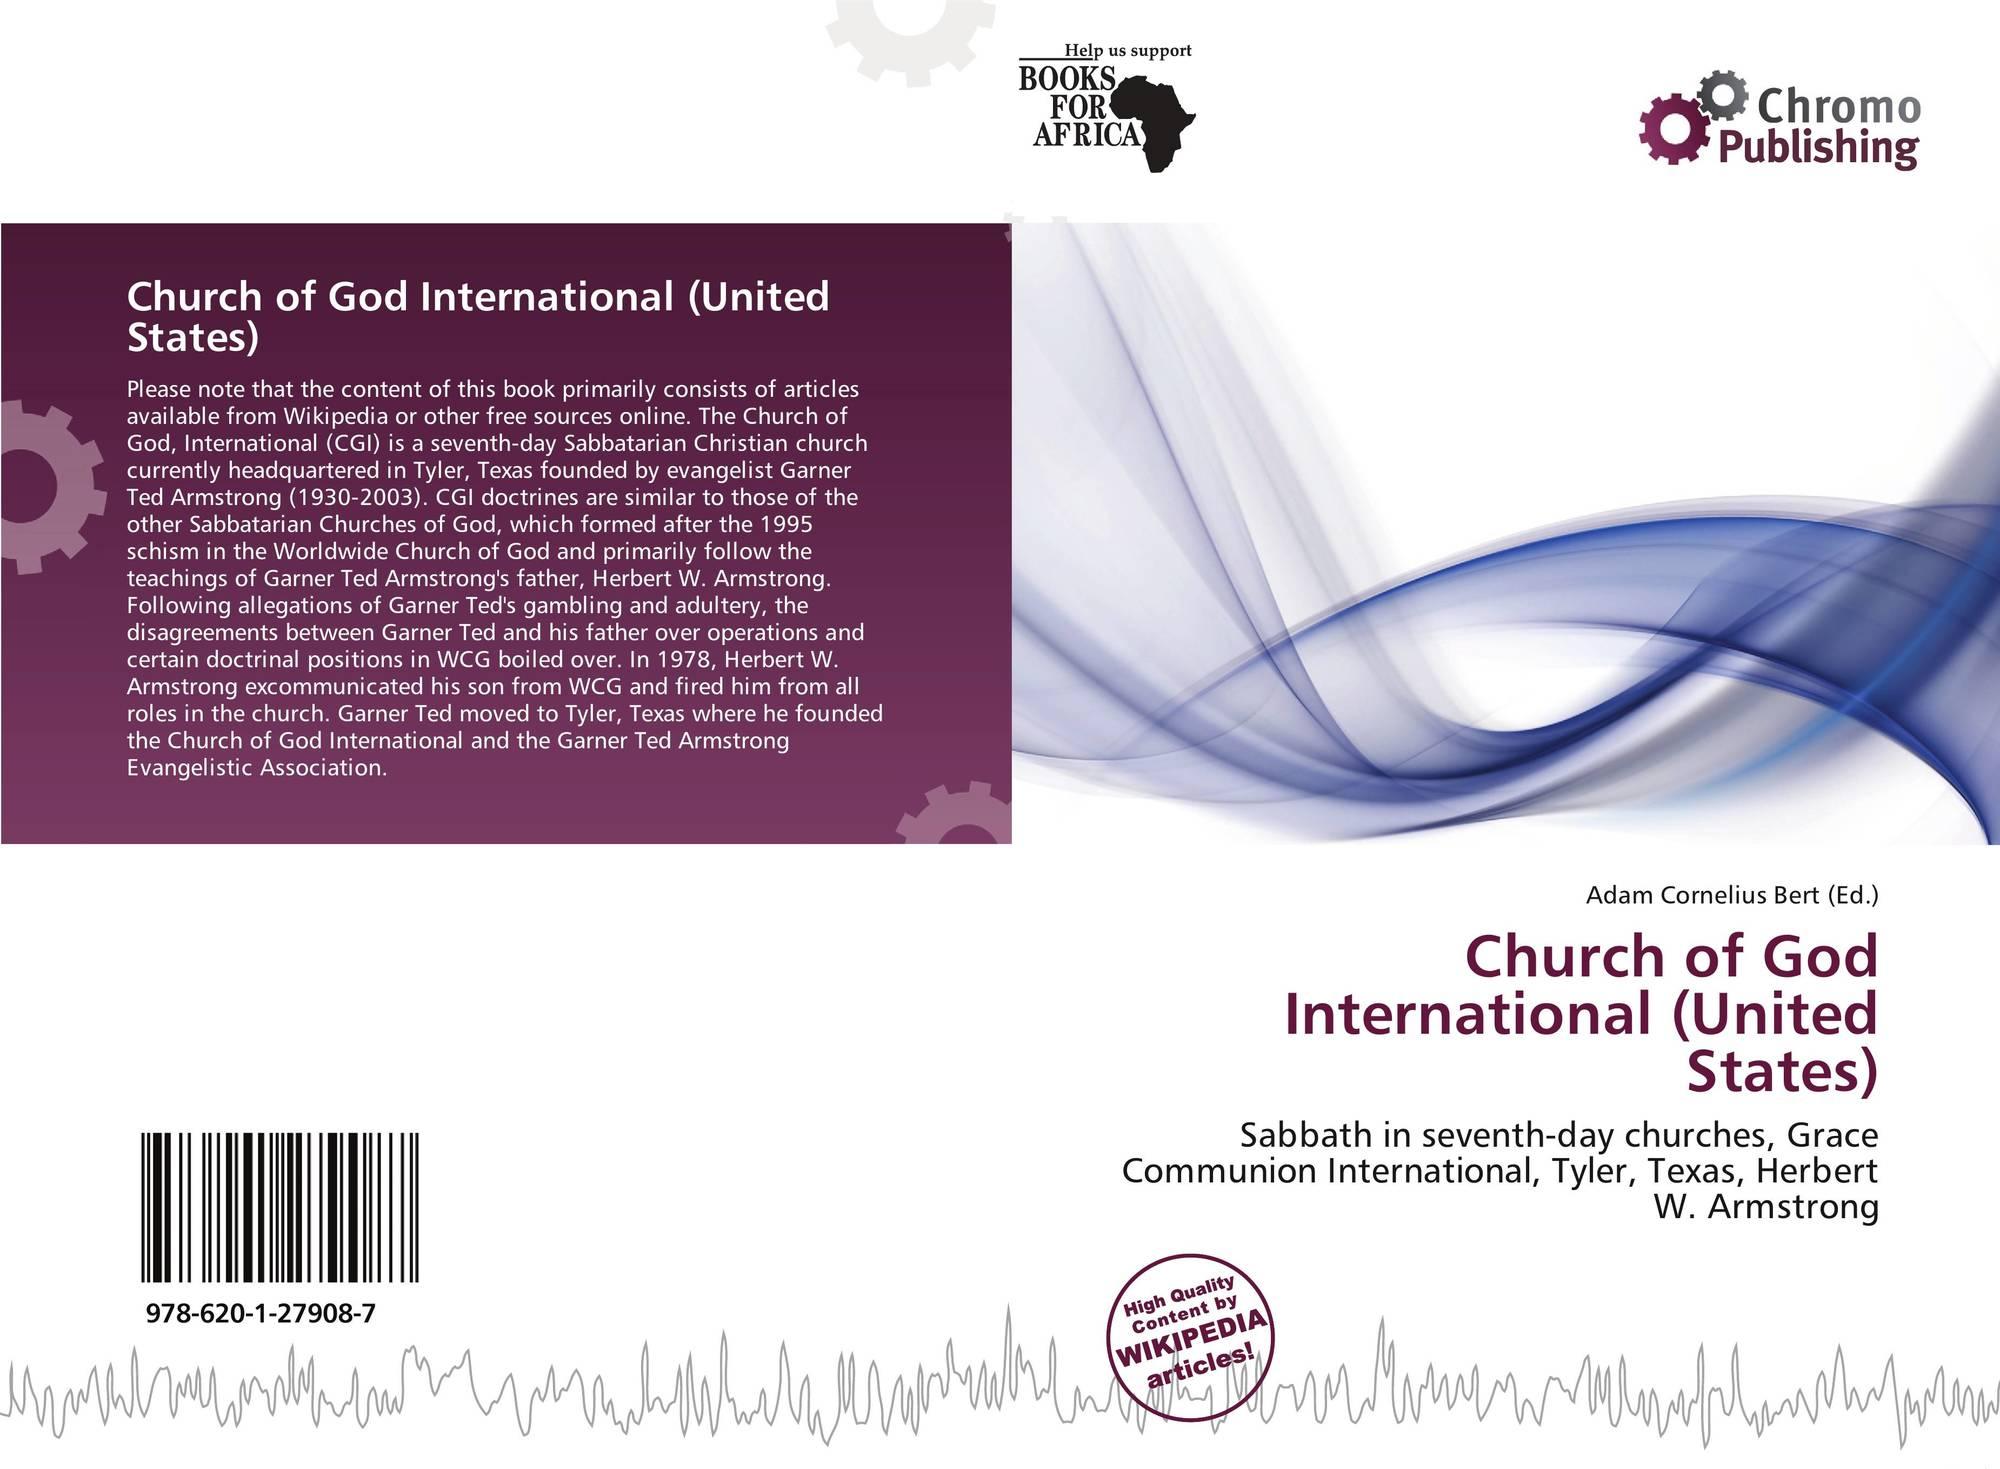 Church of God International (United States), 978-620-1-27908